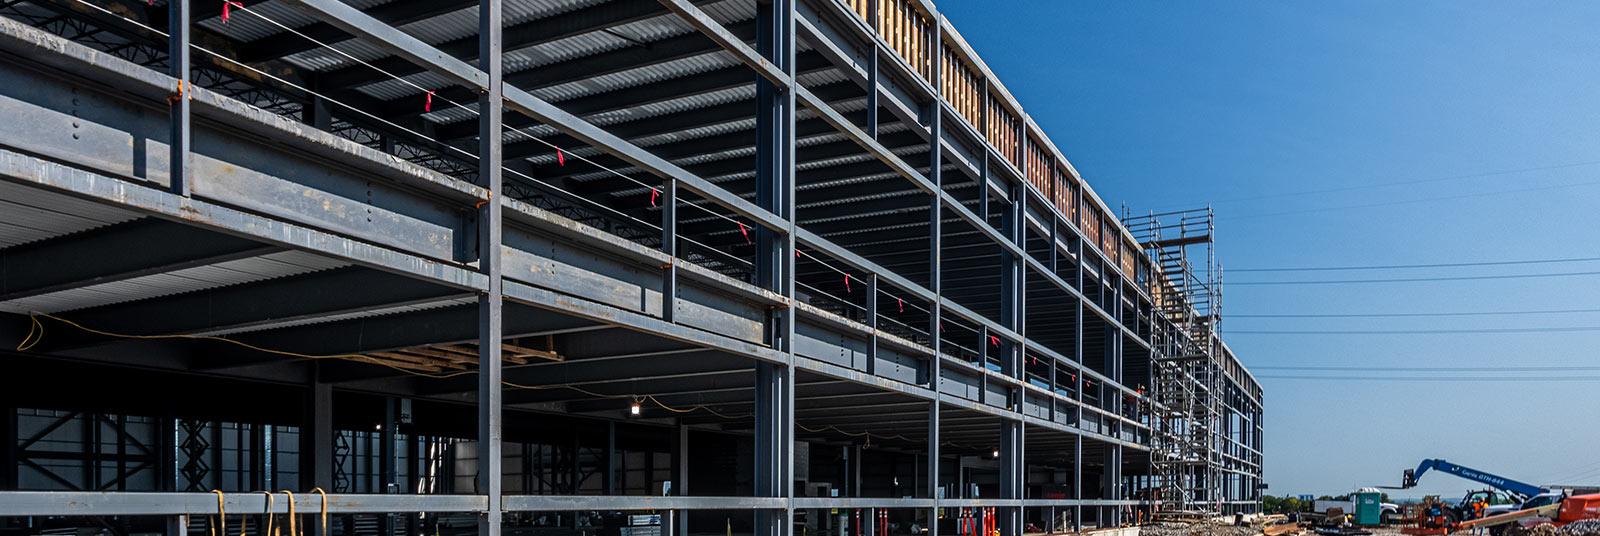 Progress on the FESTO industrial facility expansion in Mason, Ohio.